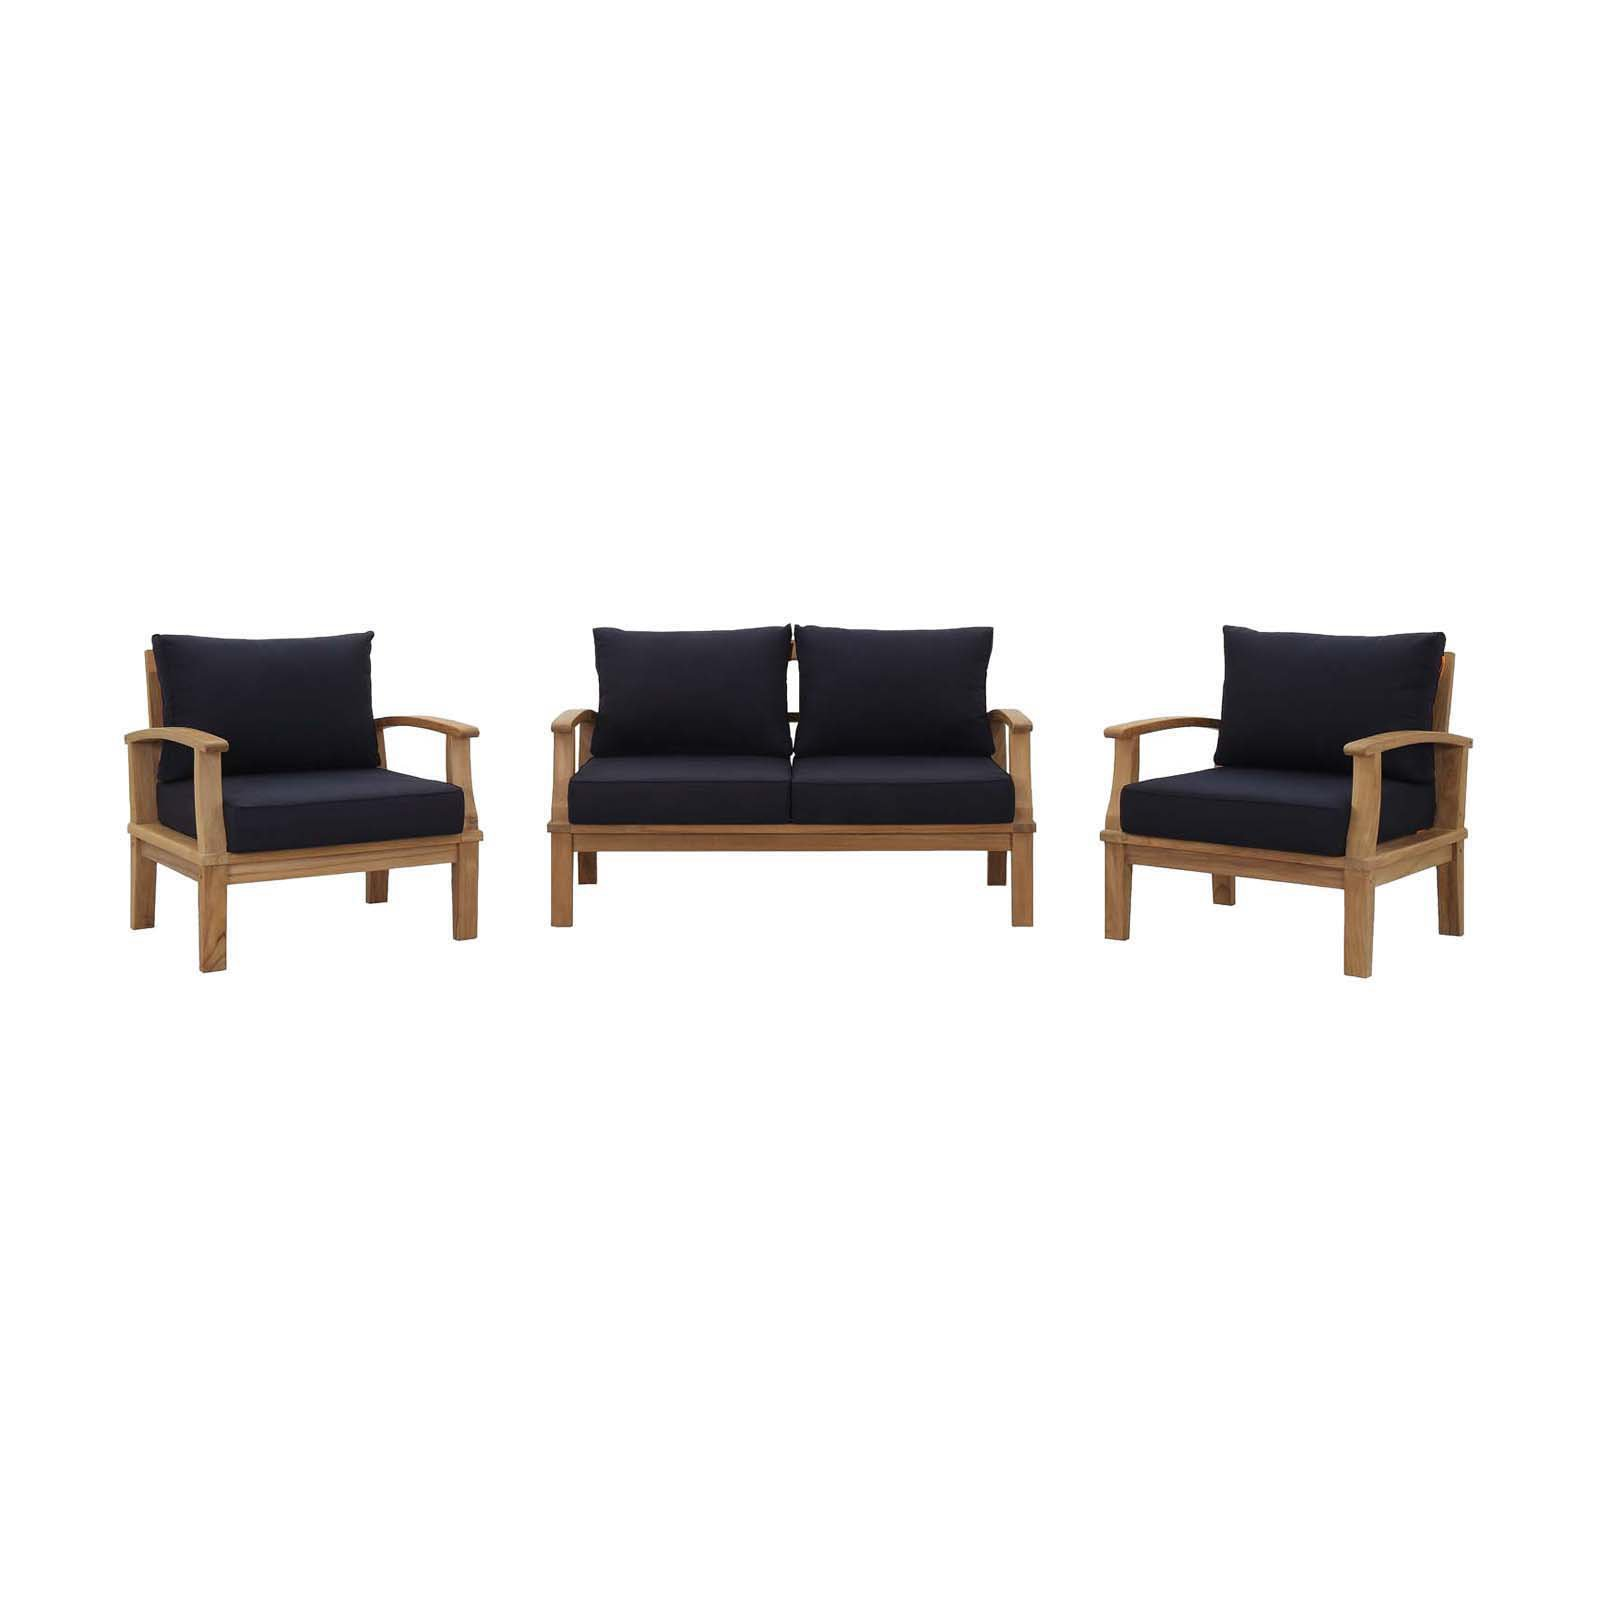 Modway Marina 3 Piece Outdoor Patio Teak Sofa Set in Natural White